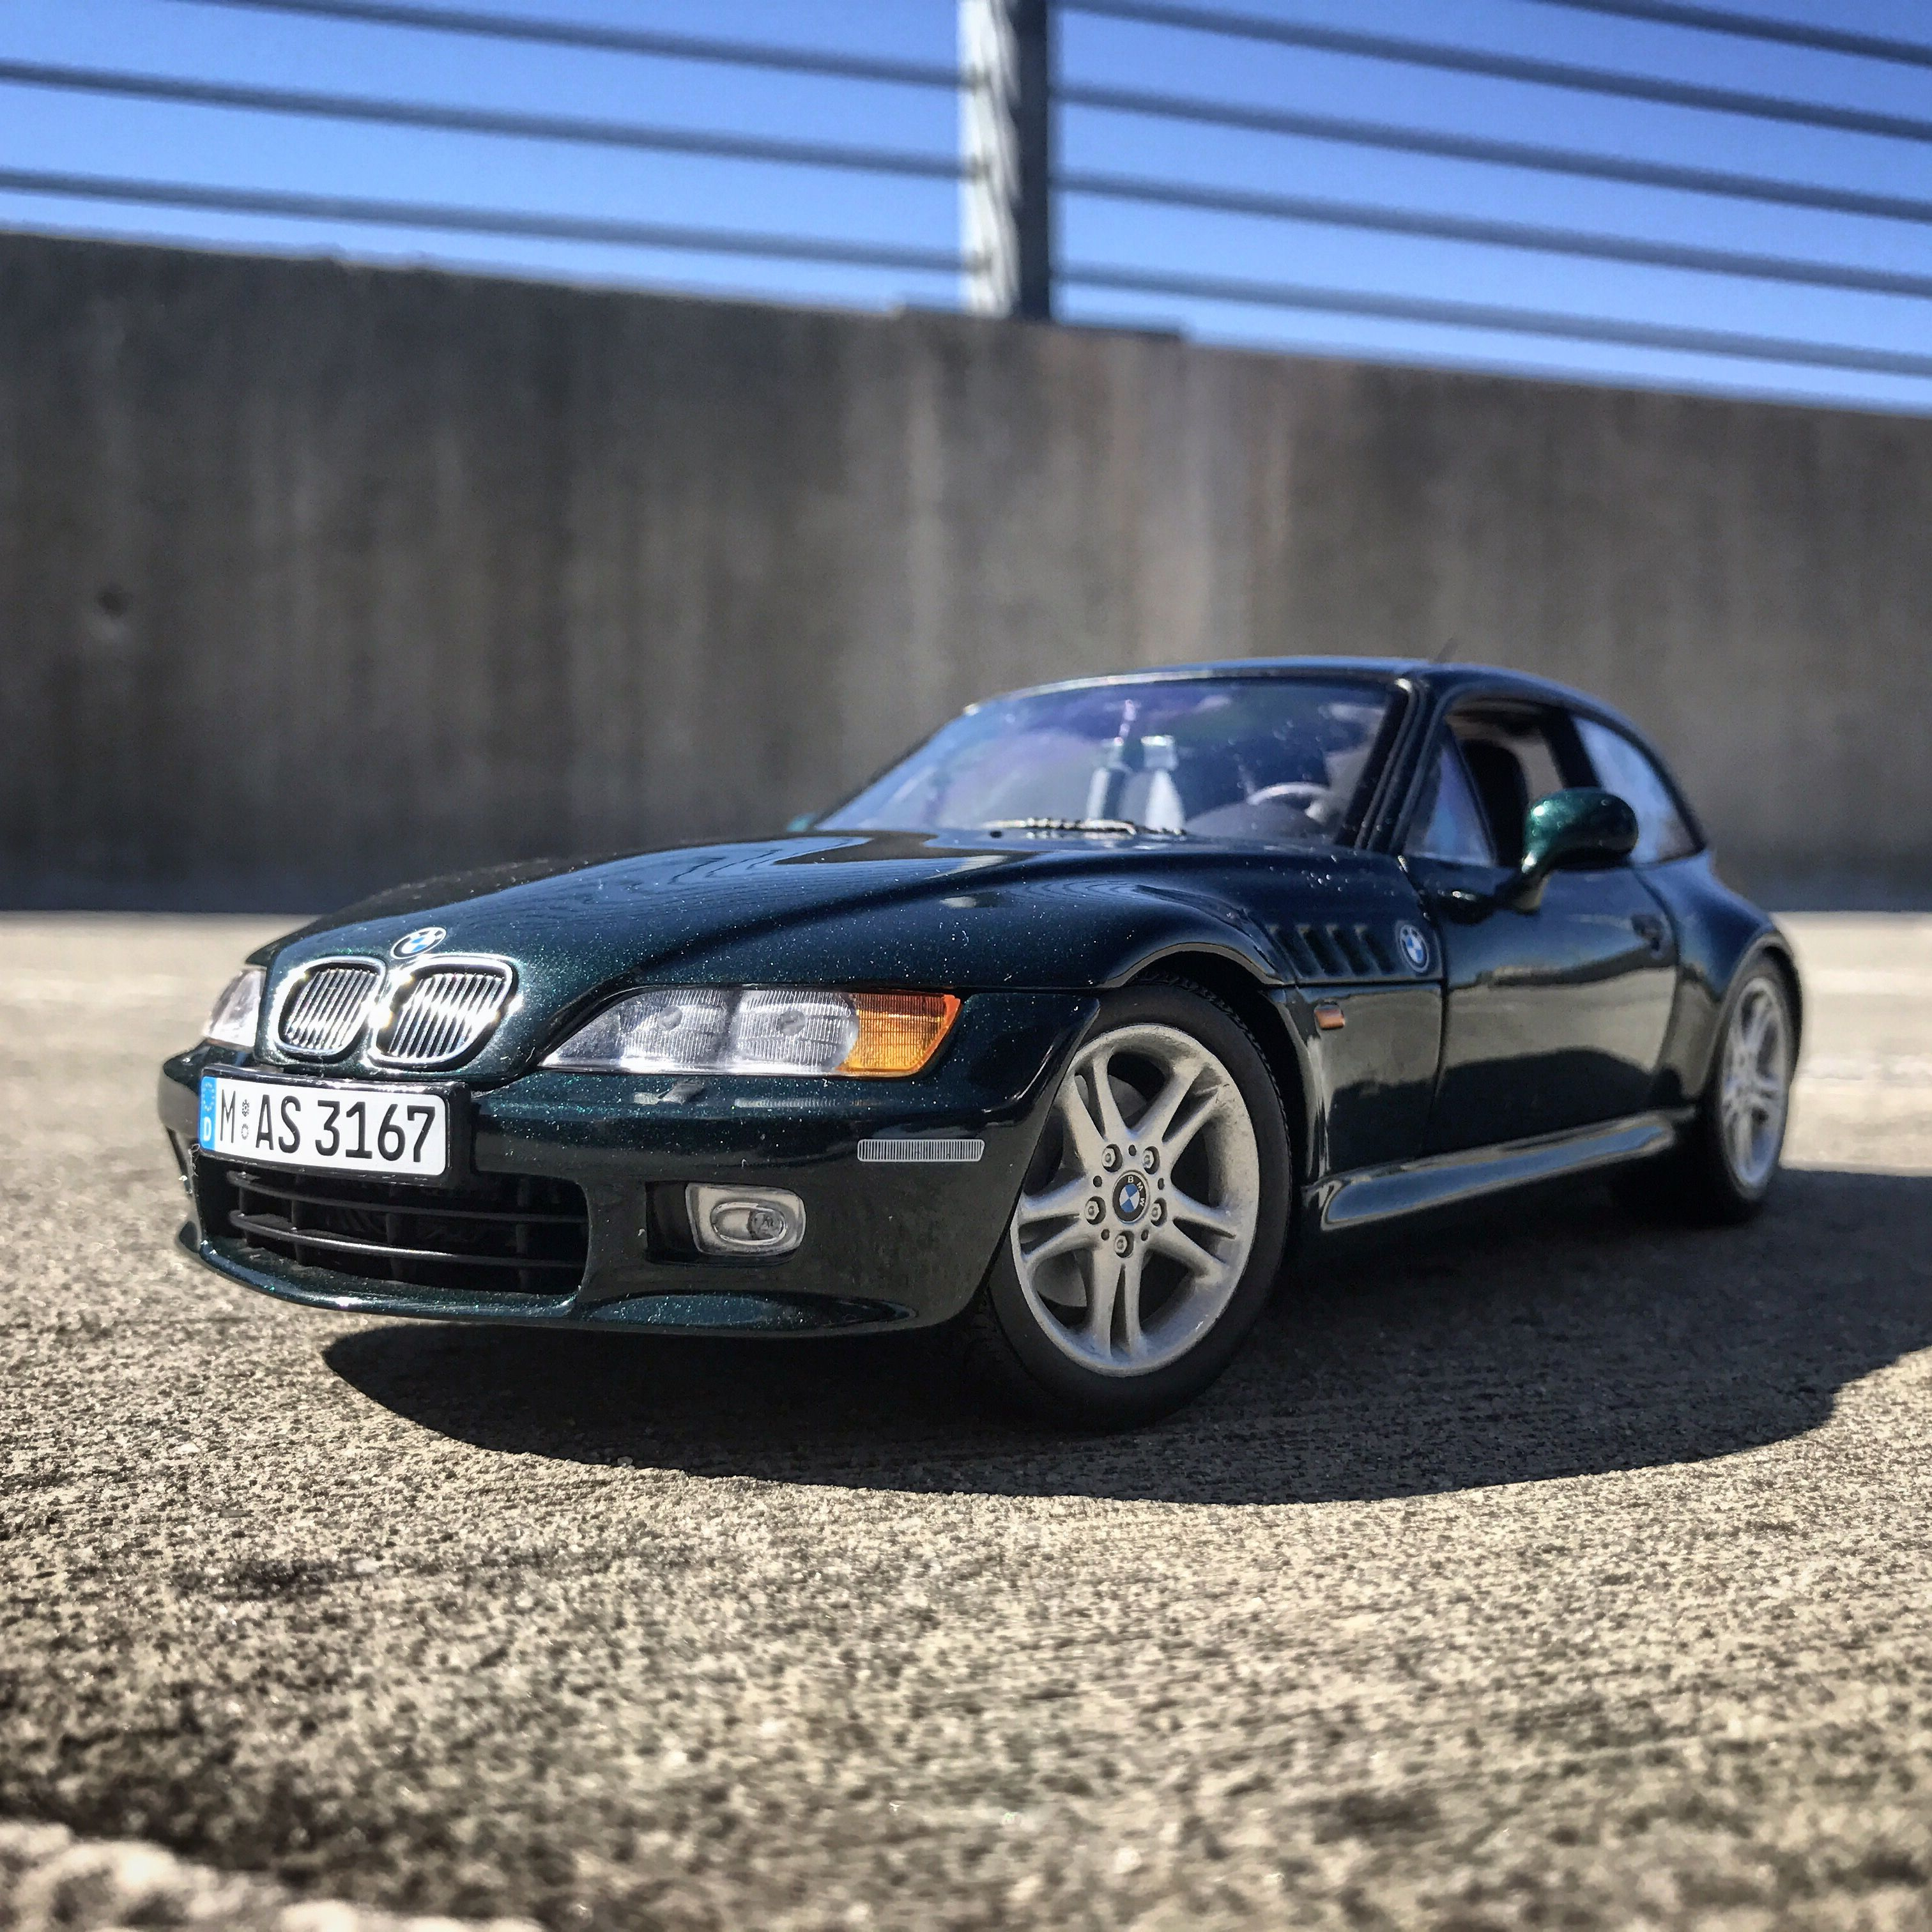 Bmw Z3 Gt: UT Models E36/8 BMW Z3 Coupe 2.8 (Dealer Edition)